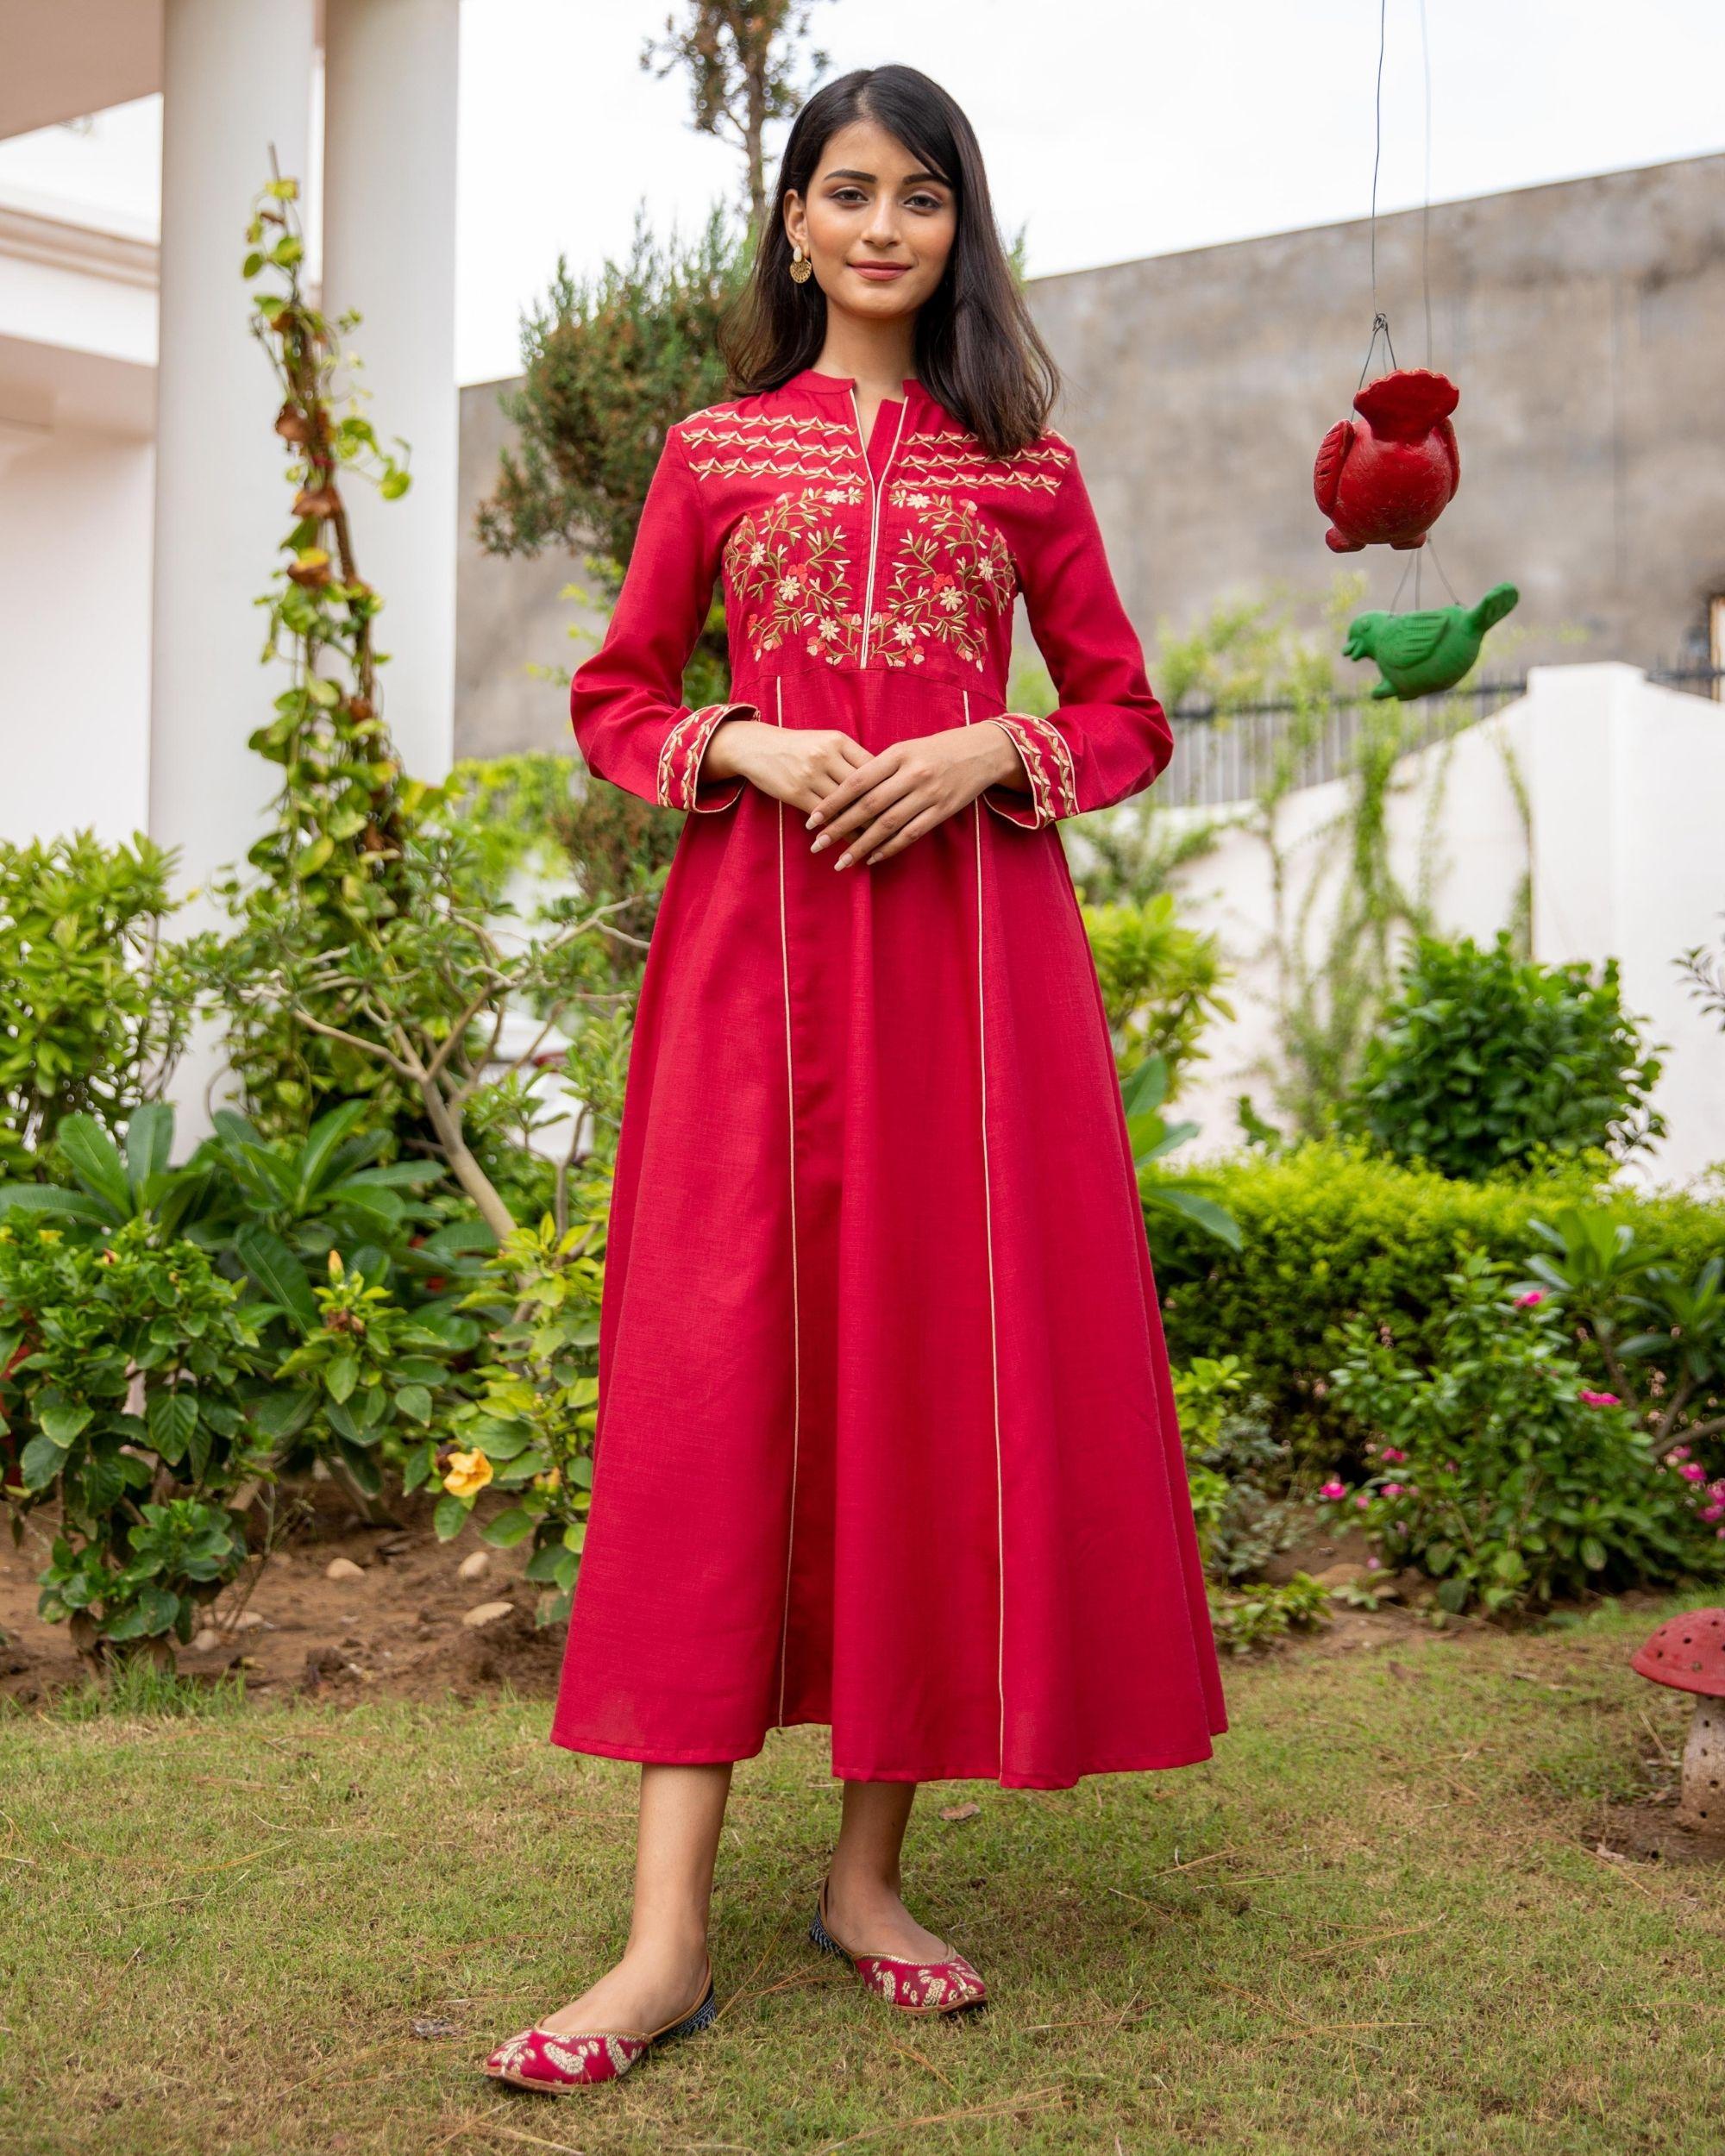 Scarlet red floral embroidered yoke kurta